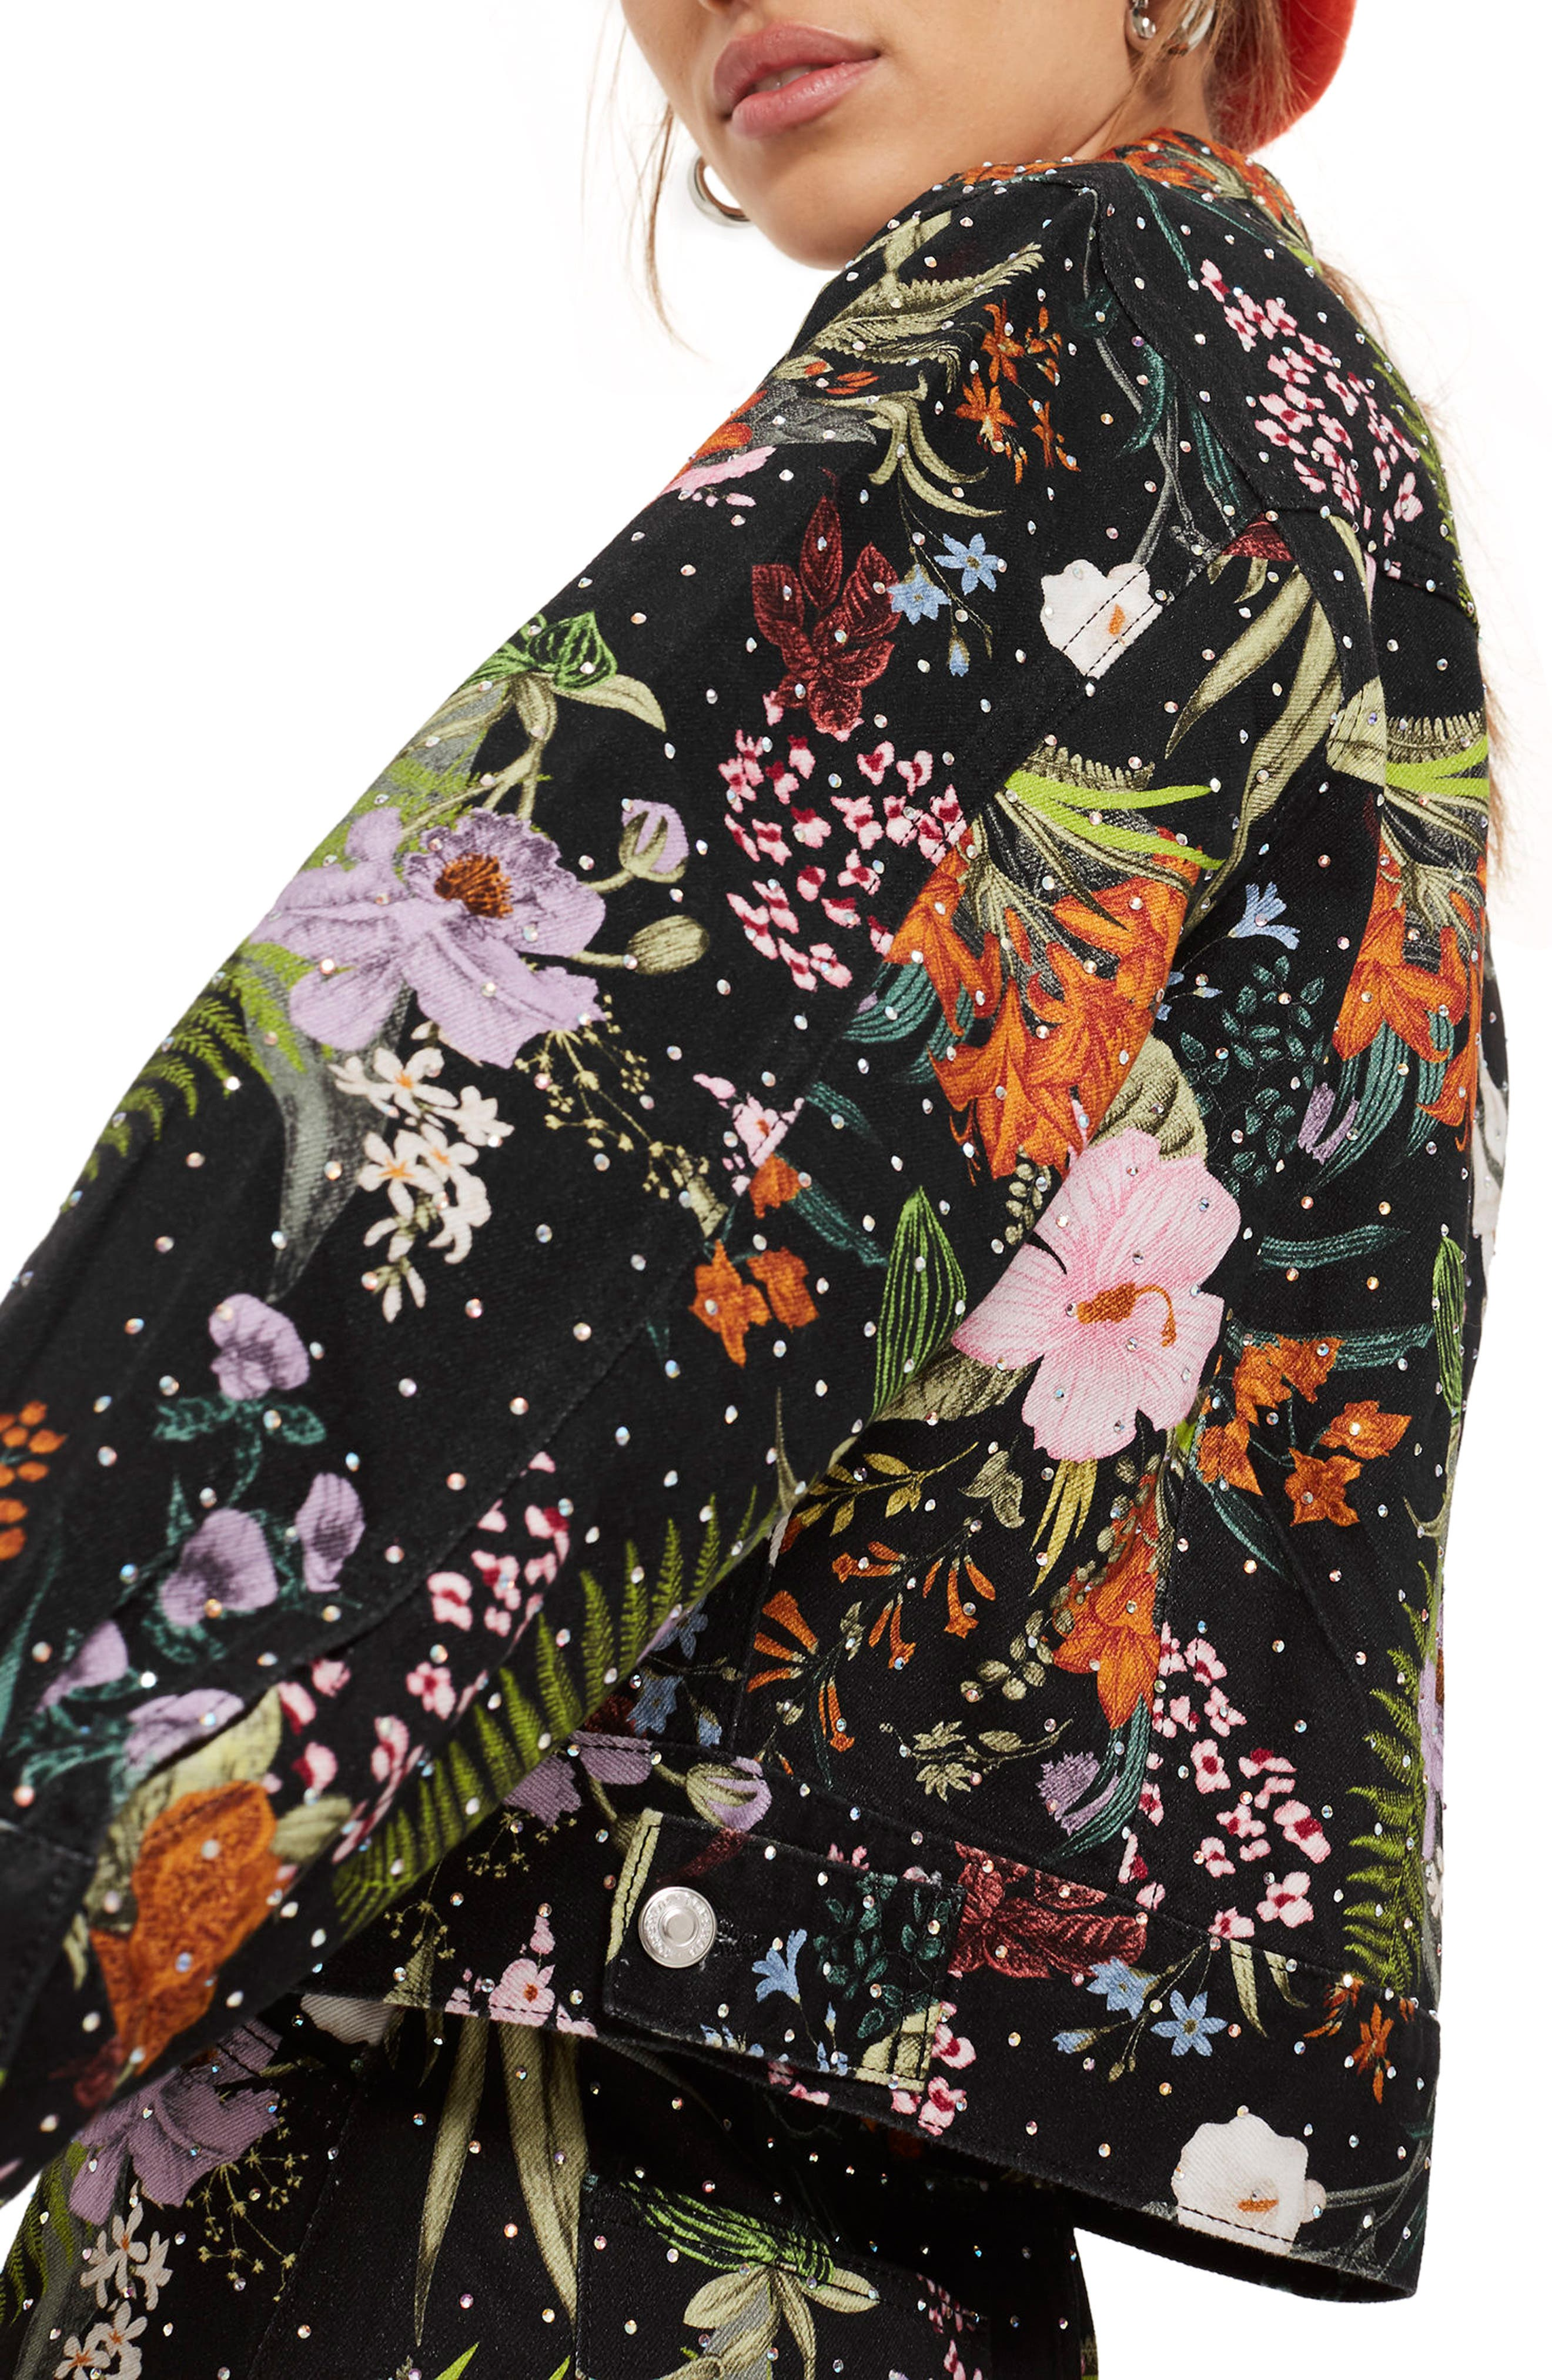 Hawaii Floral Crystal Denim Jacket,                             Alternate thumbnail 3, color,                             001